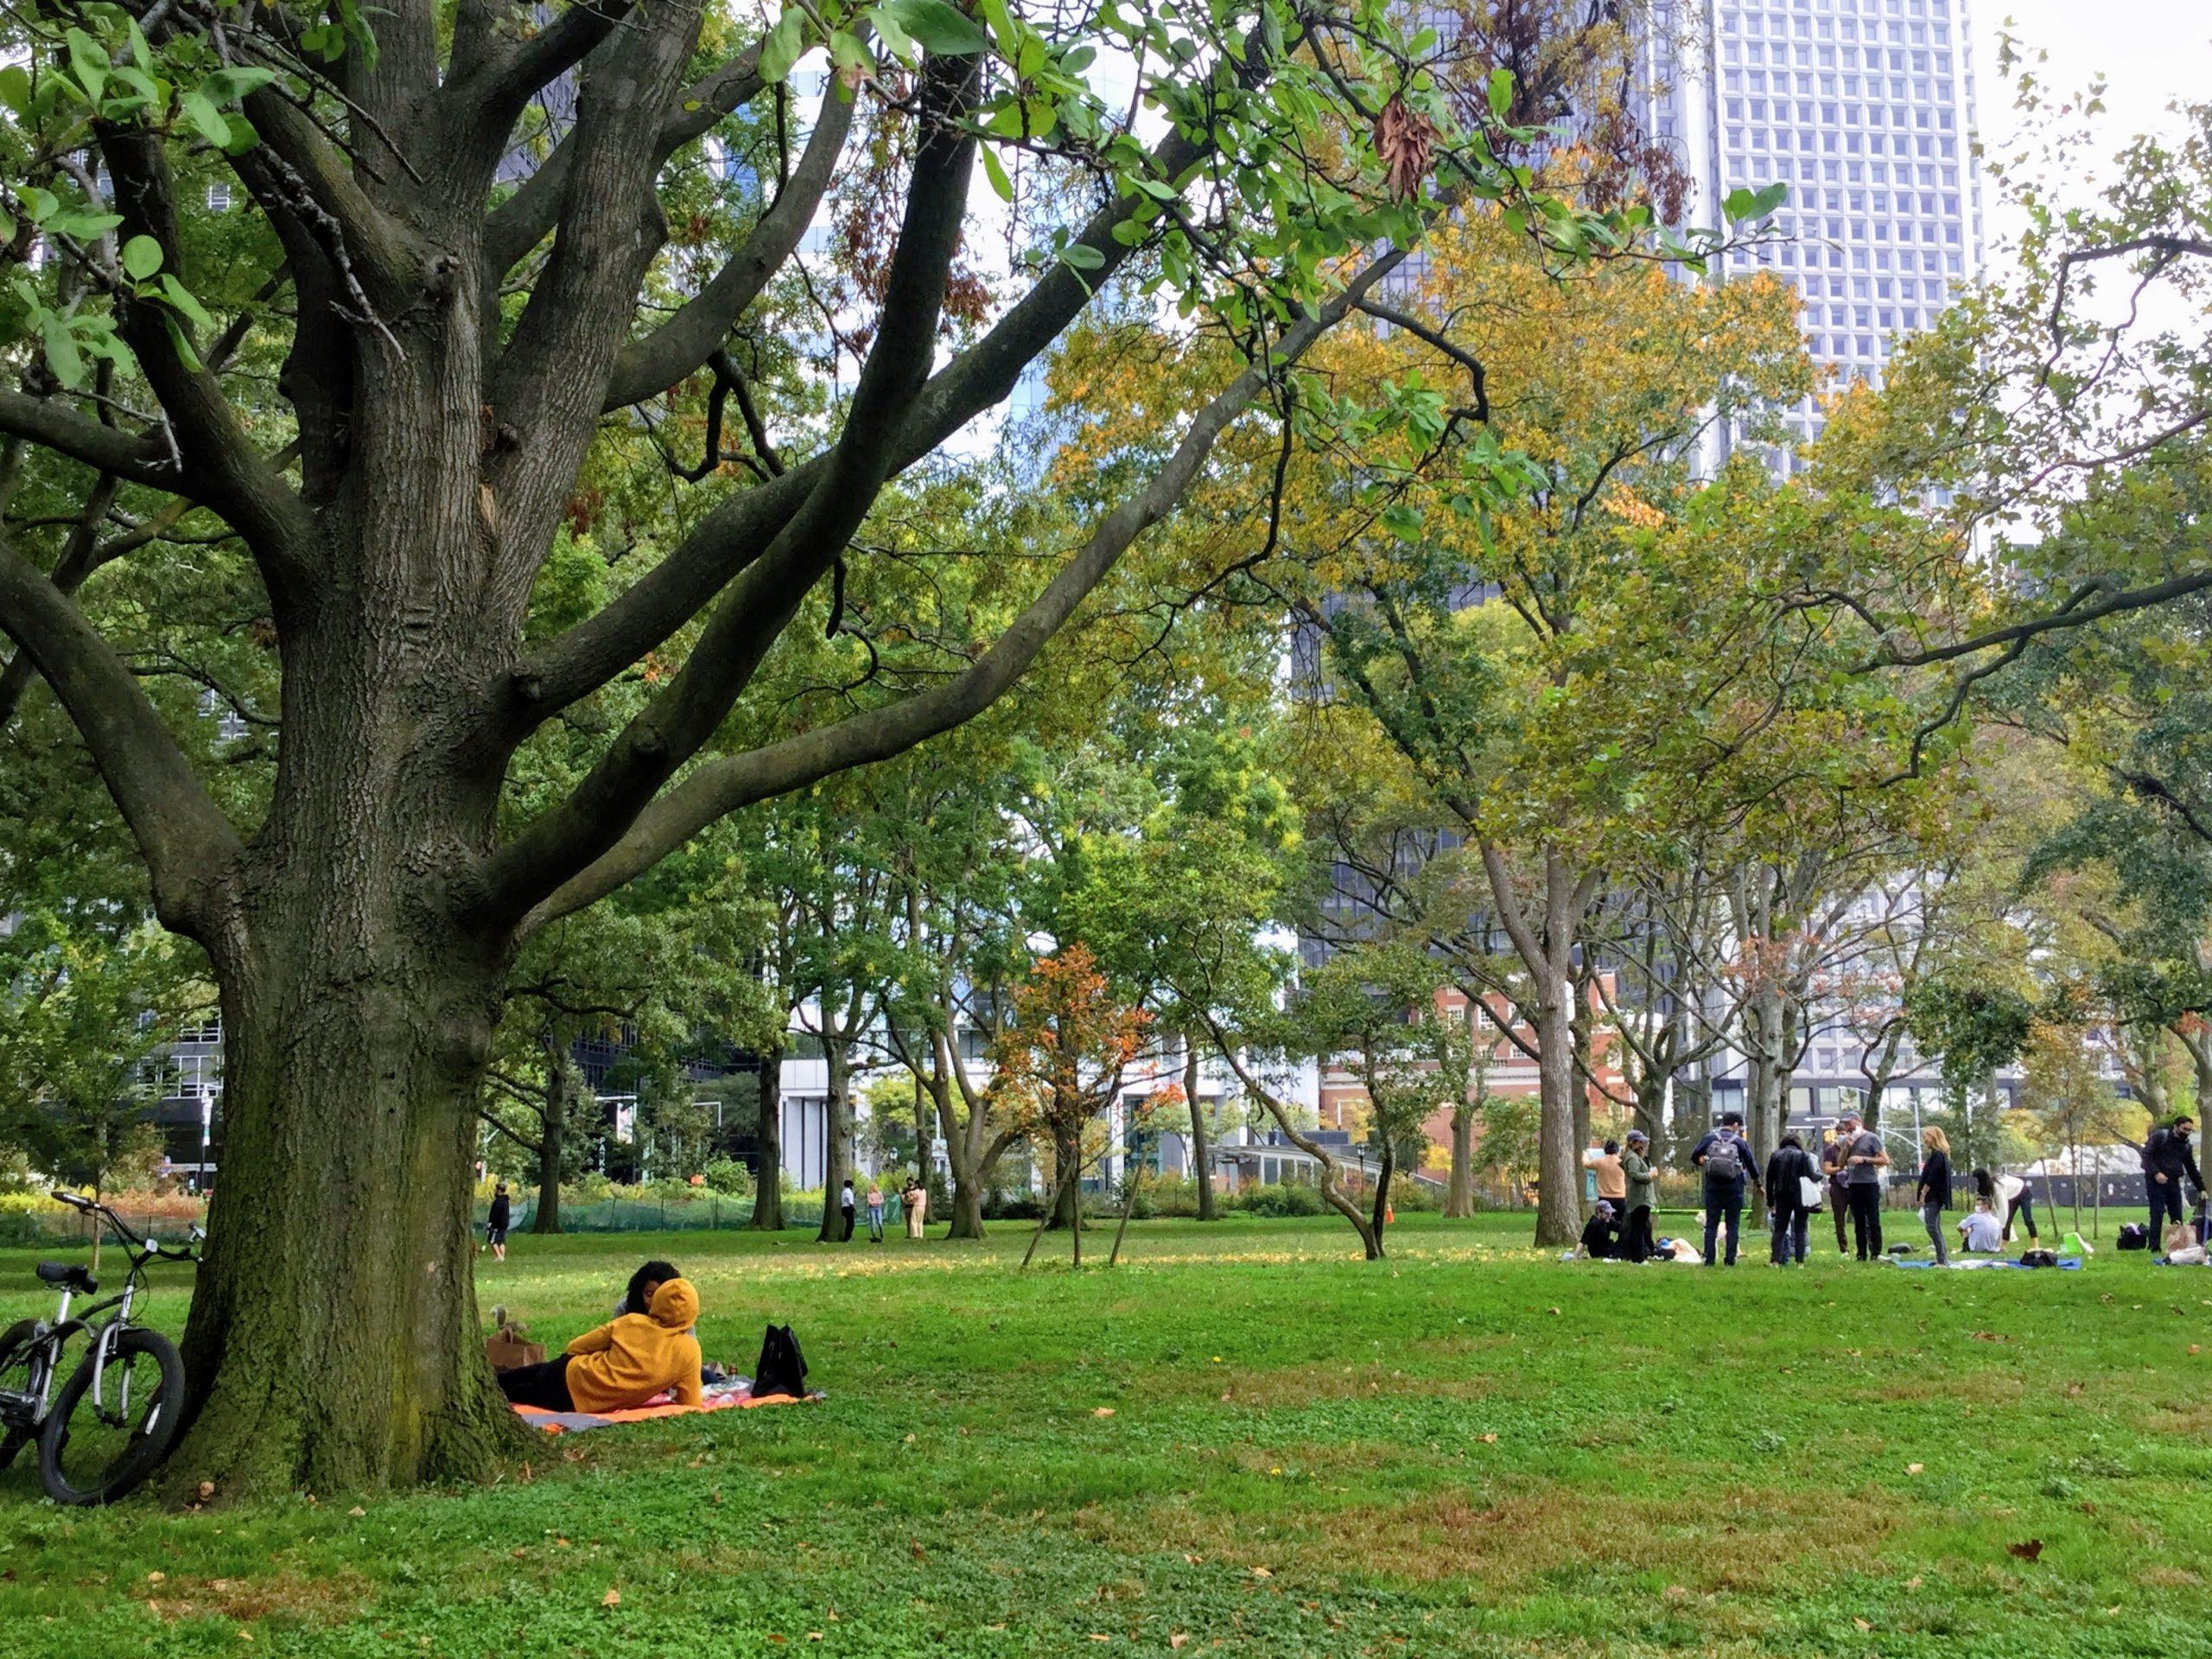 Battery Park grassy field